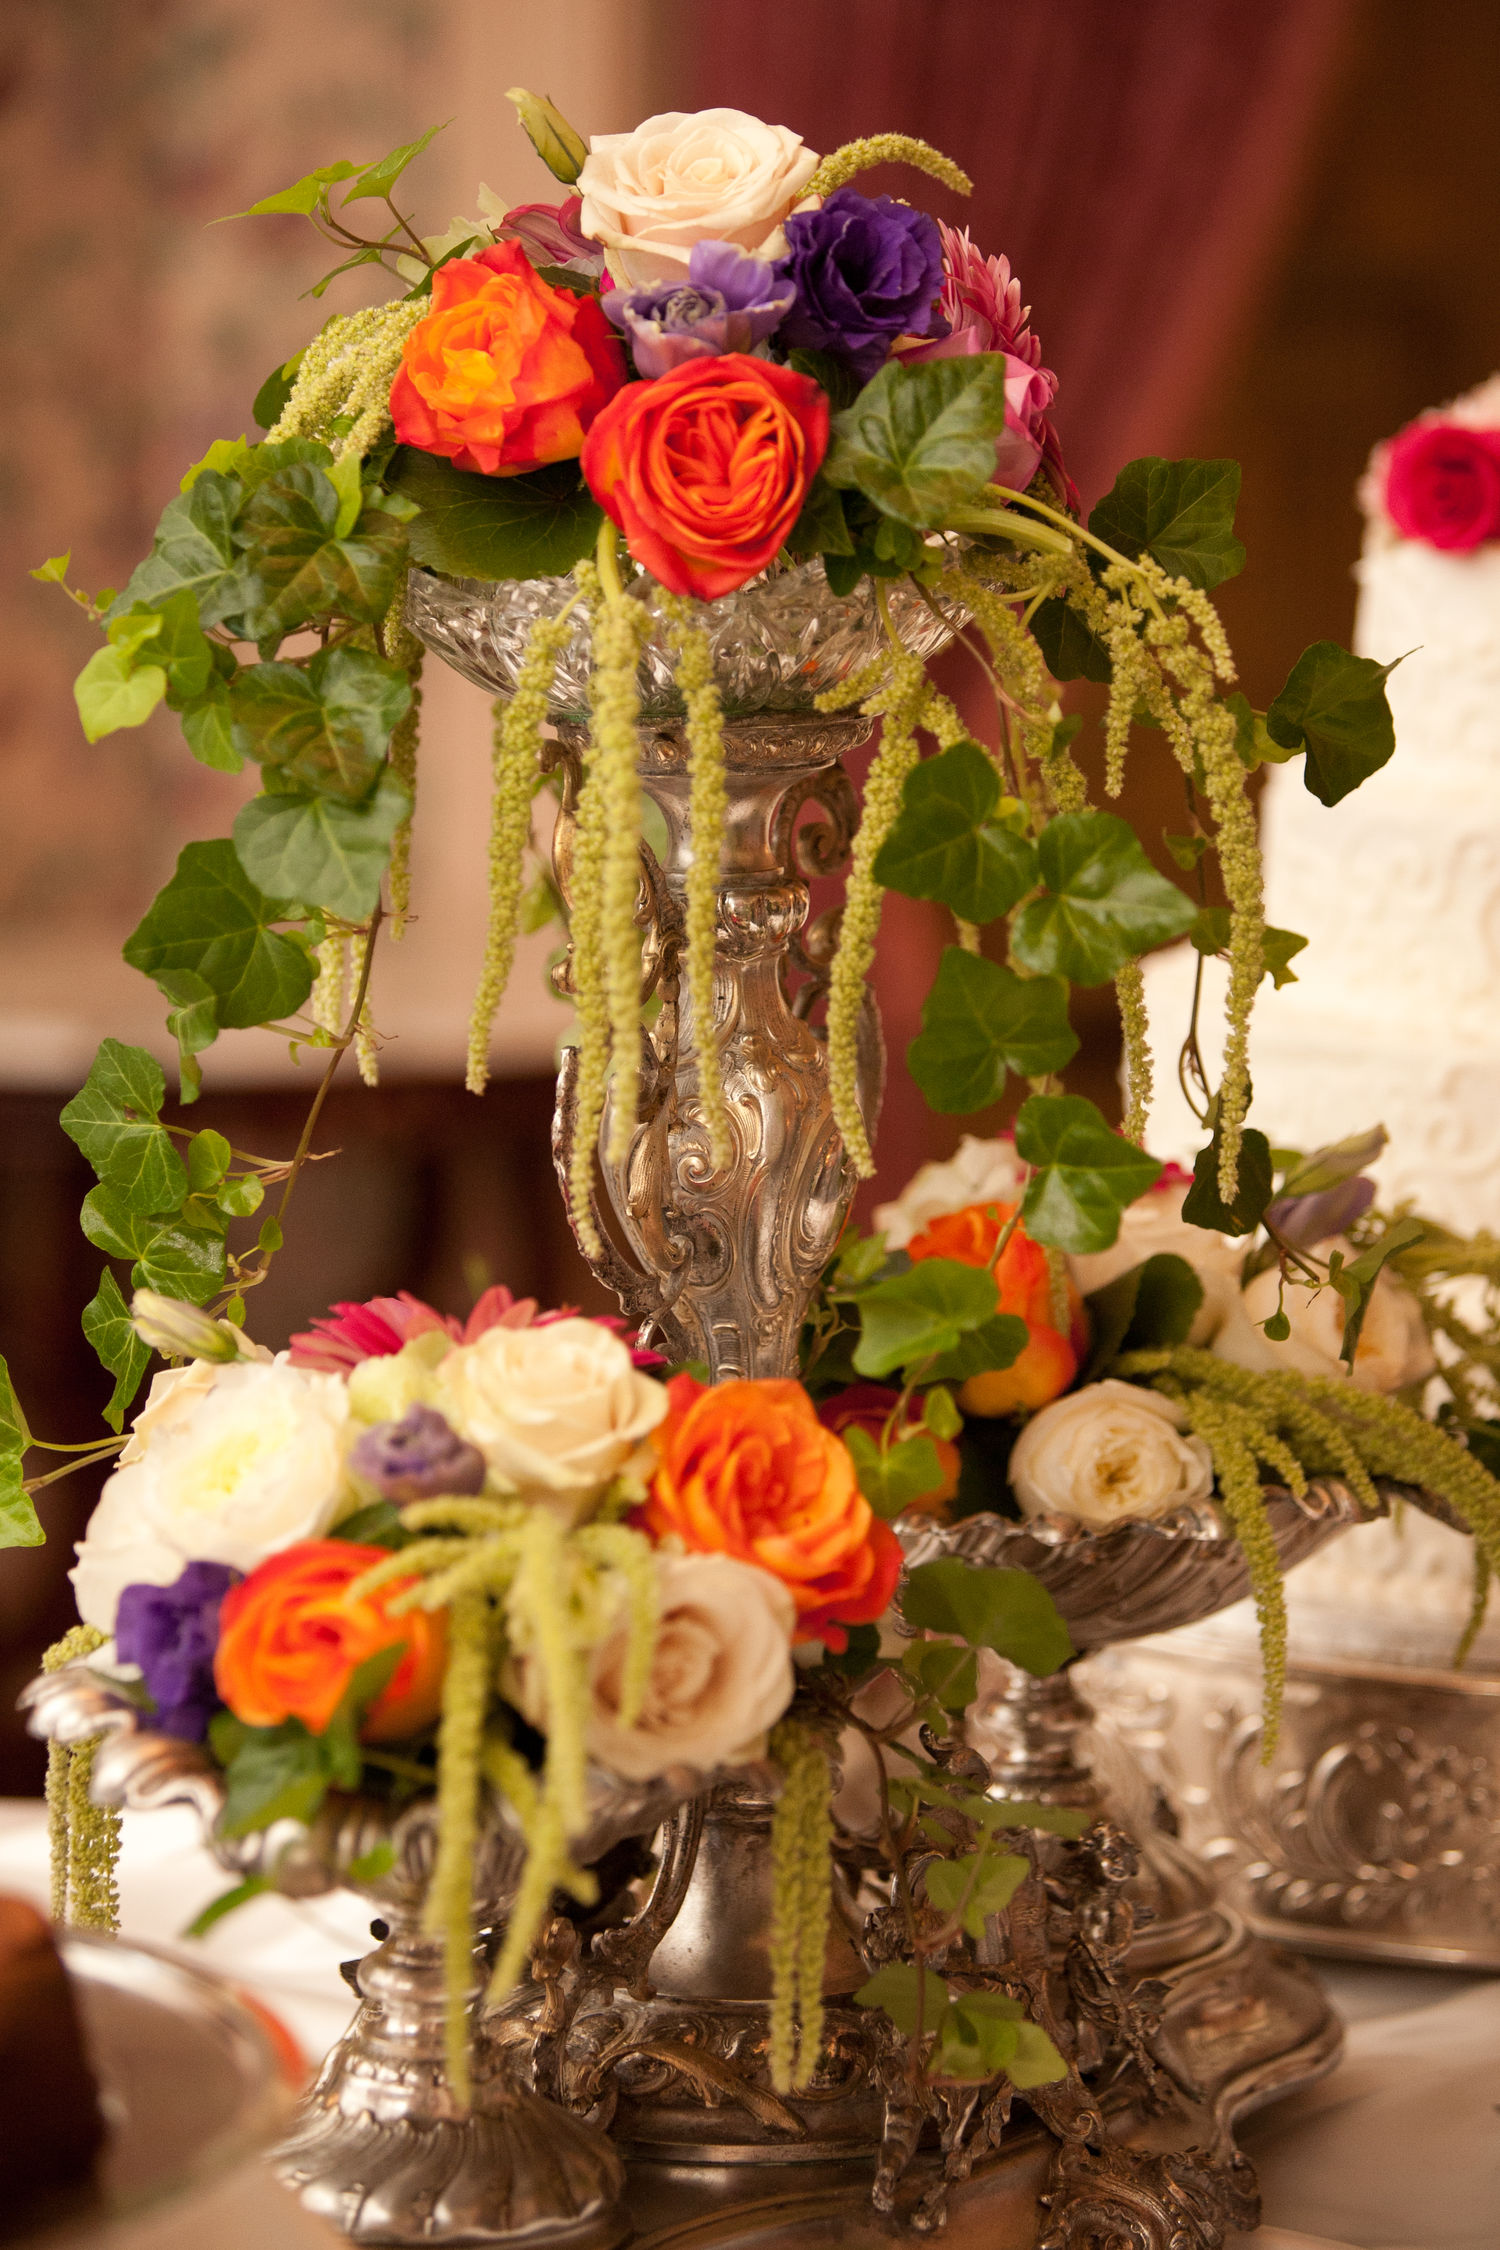 Wedding Reception Flowers Centerpieces Decorations